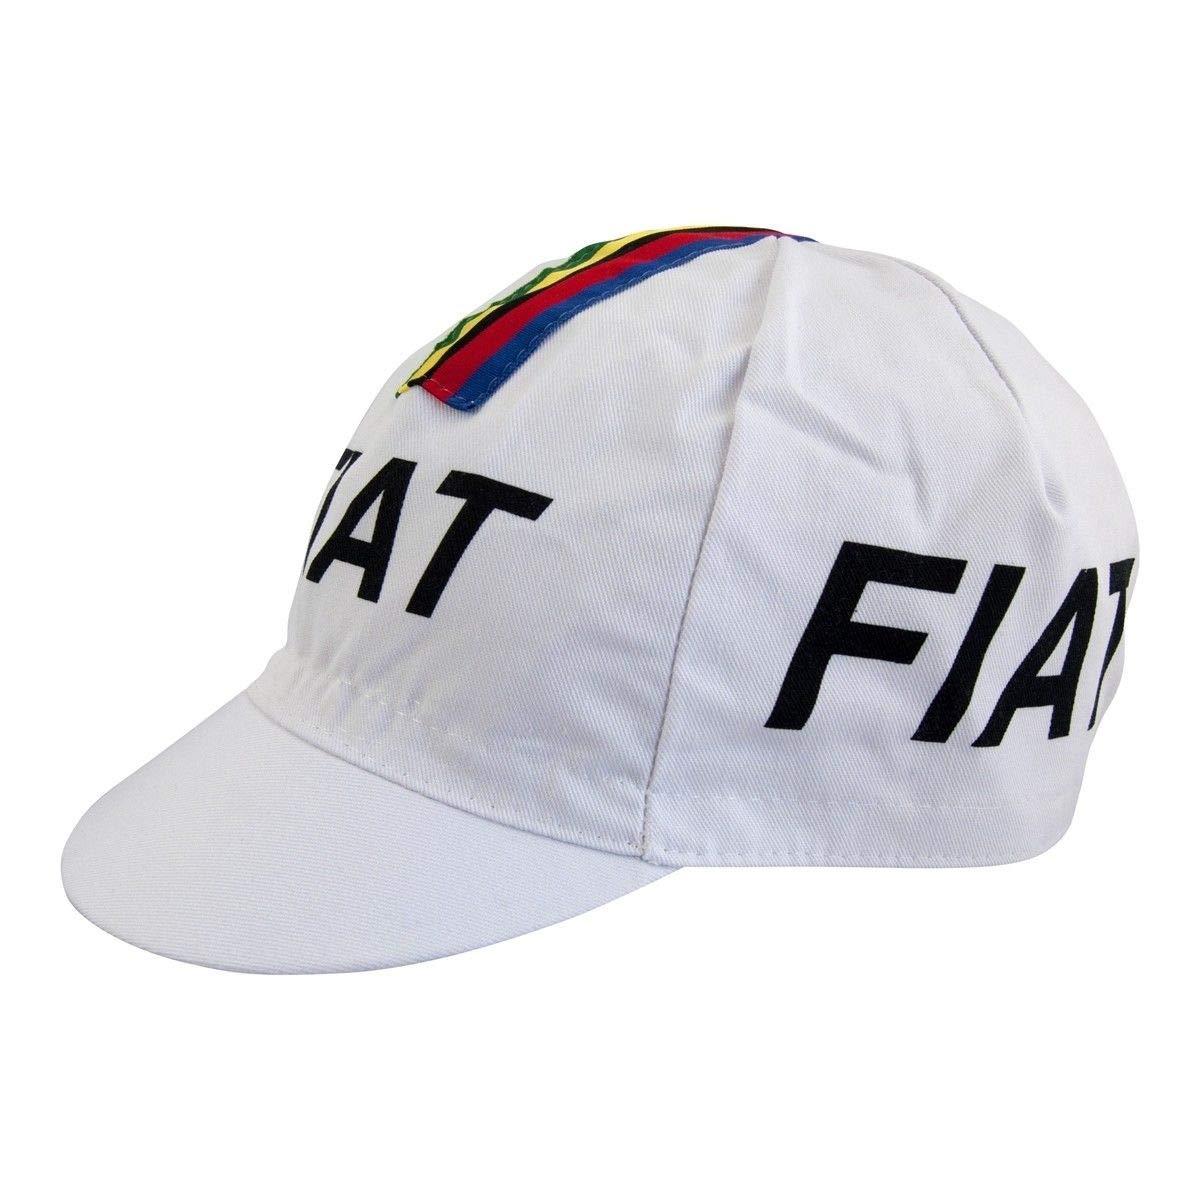 1d38ec27e94 Amazon.com   Eddy Merckx Fiat World Champion Cycling Cap - White With  Rainbow Bands Stripes   Sports   Outdoors